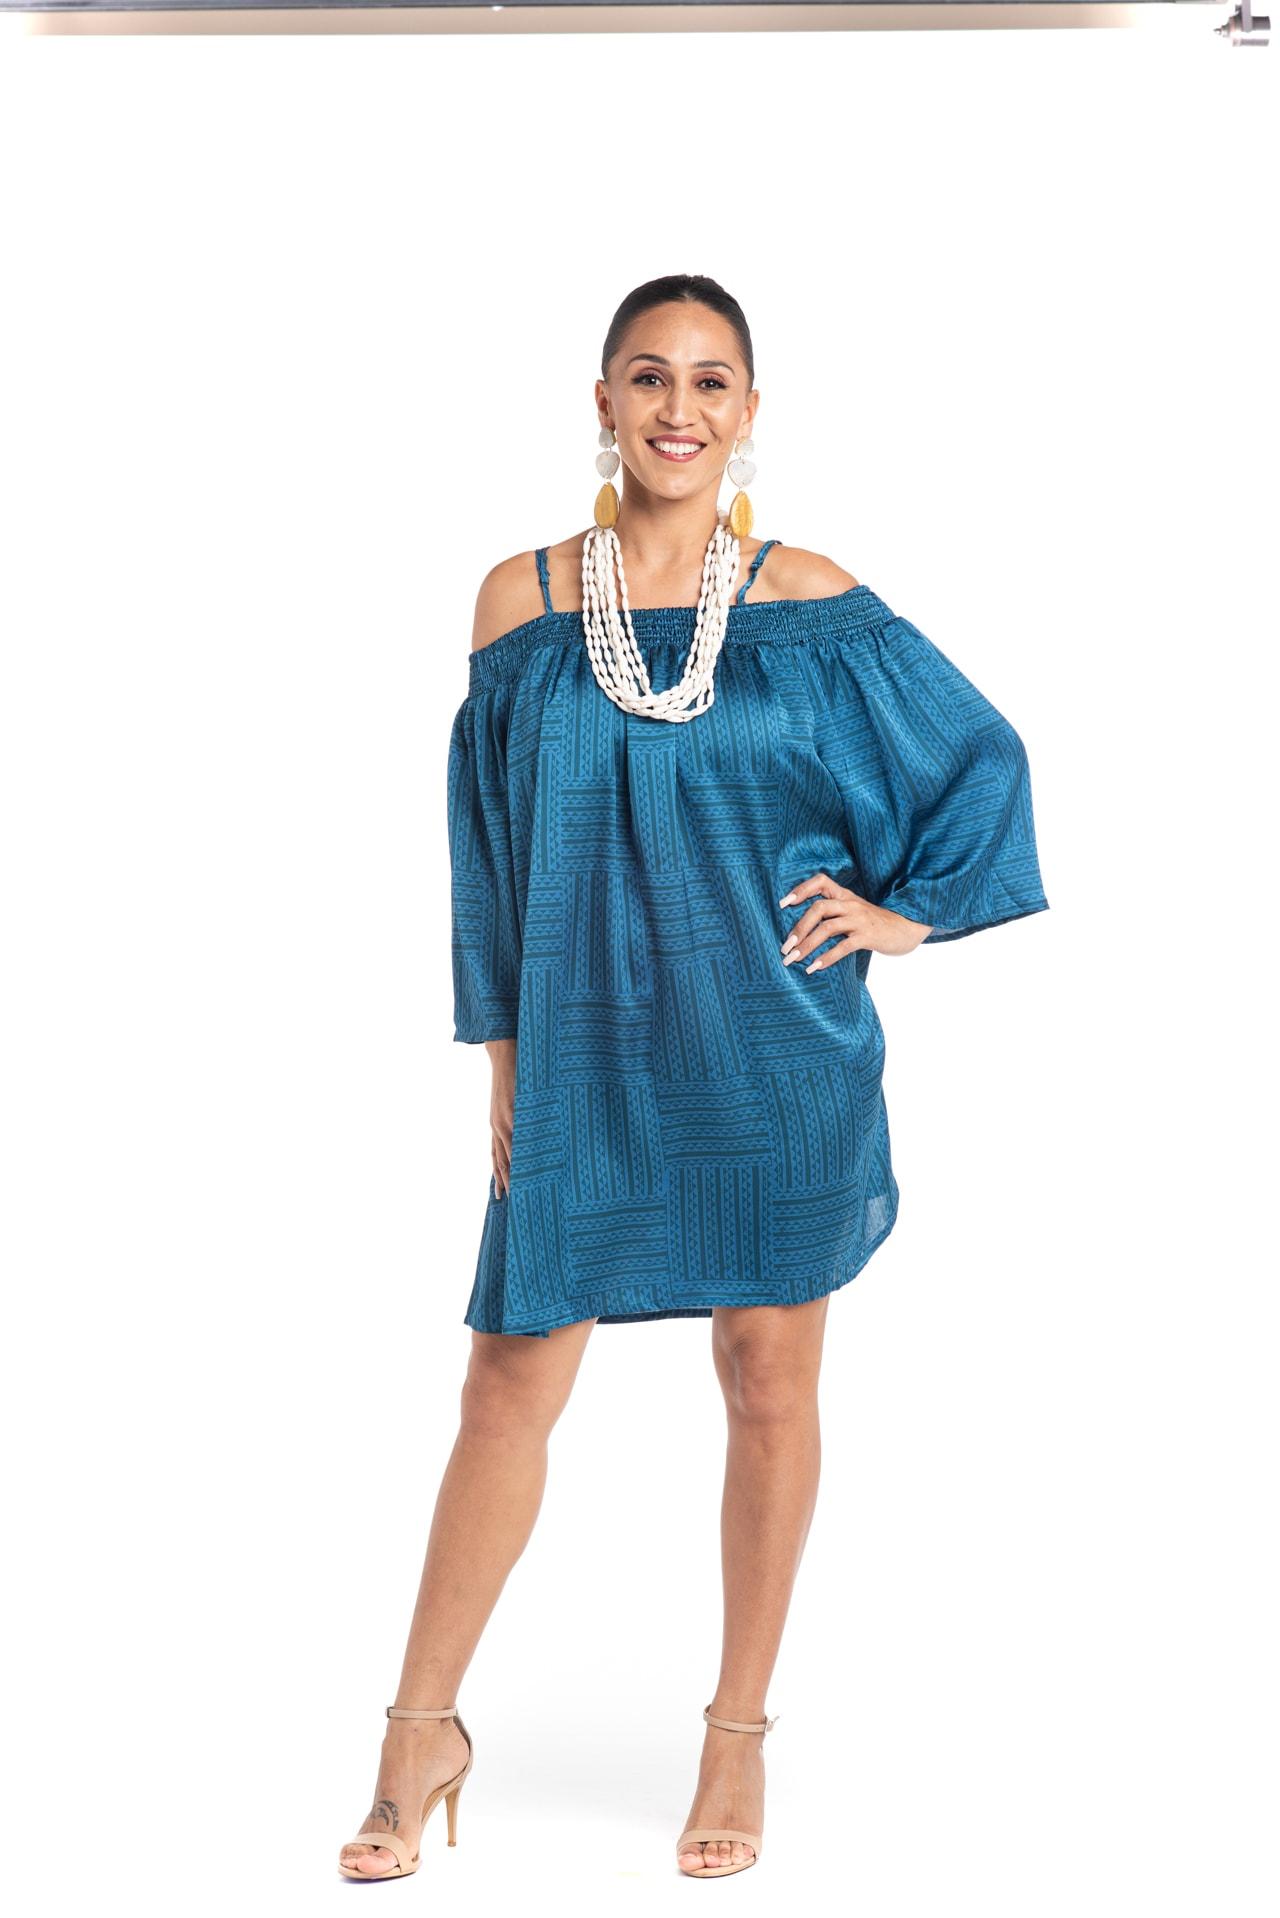 Model wearing Kauai Dress in Blue - Front View